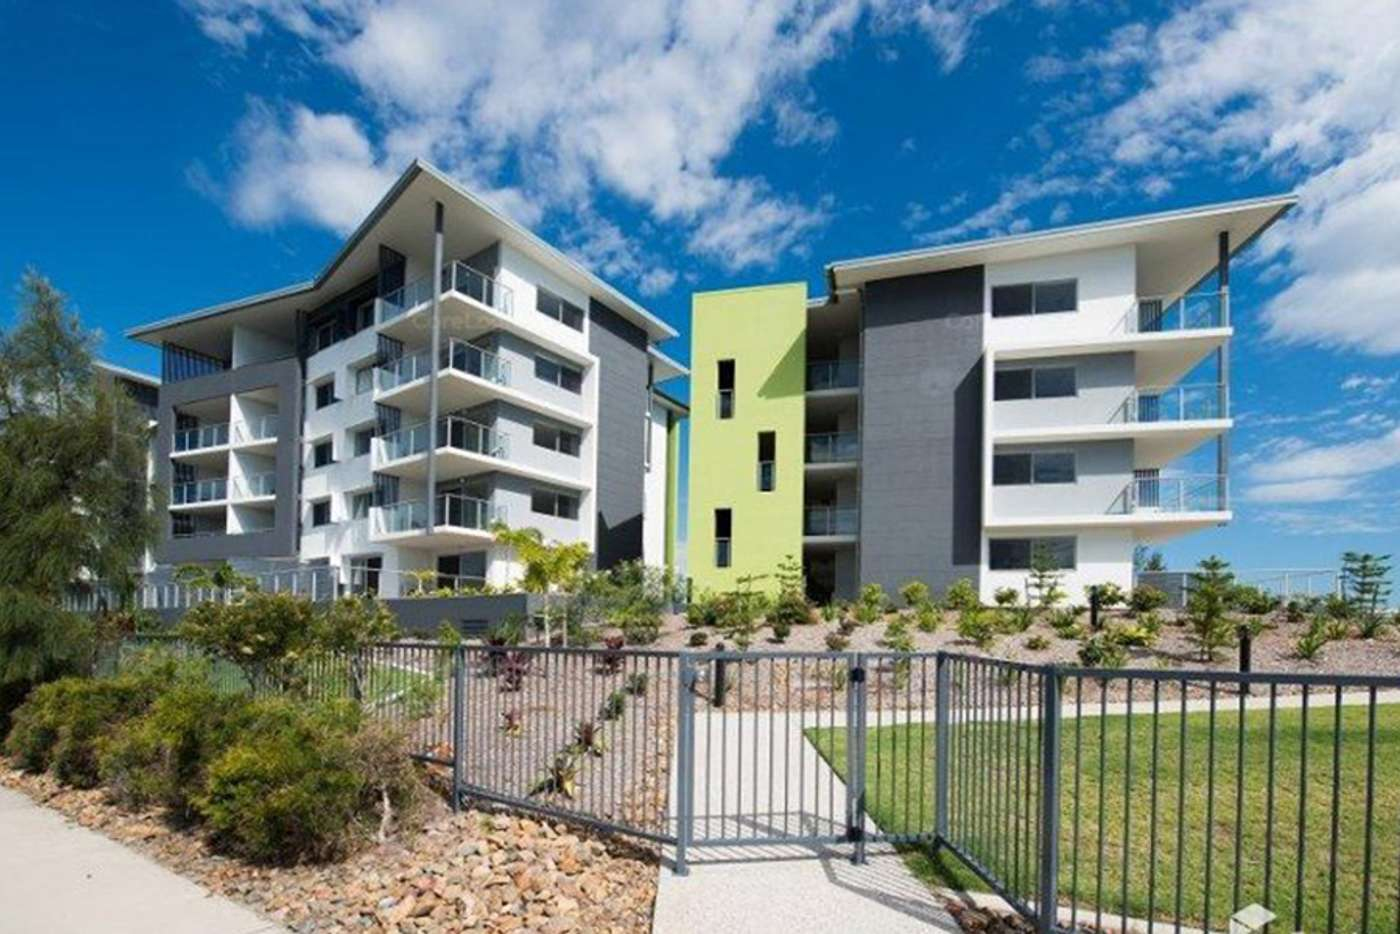 Main view of Homely apartment listing, 78/99 Birtinya Boulevard, Birtinya QLD 4575